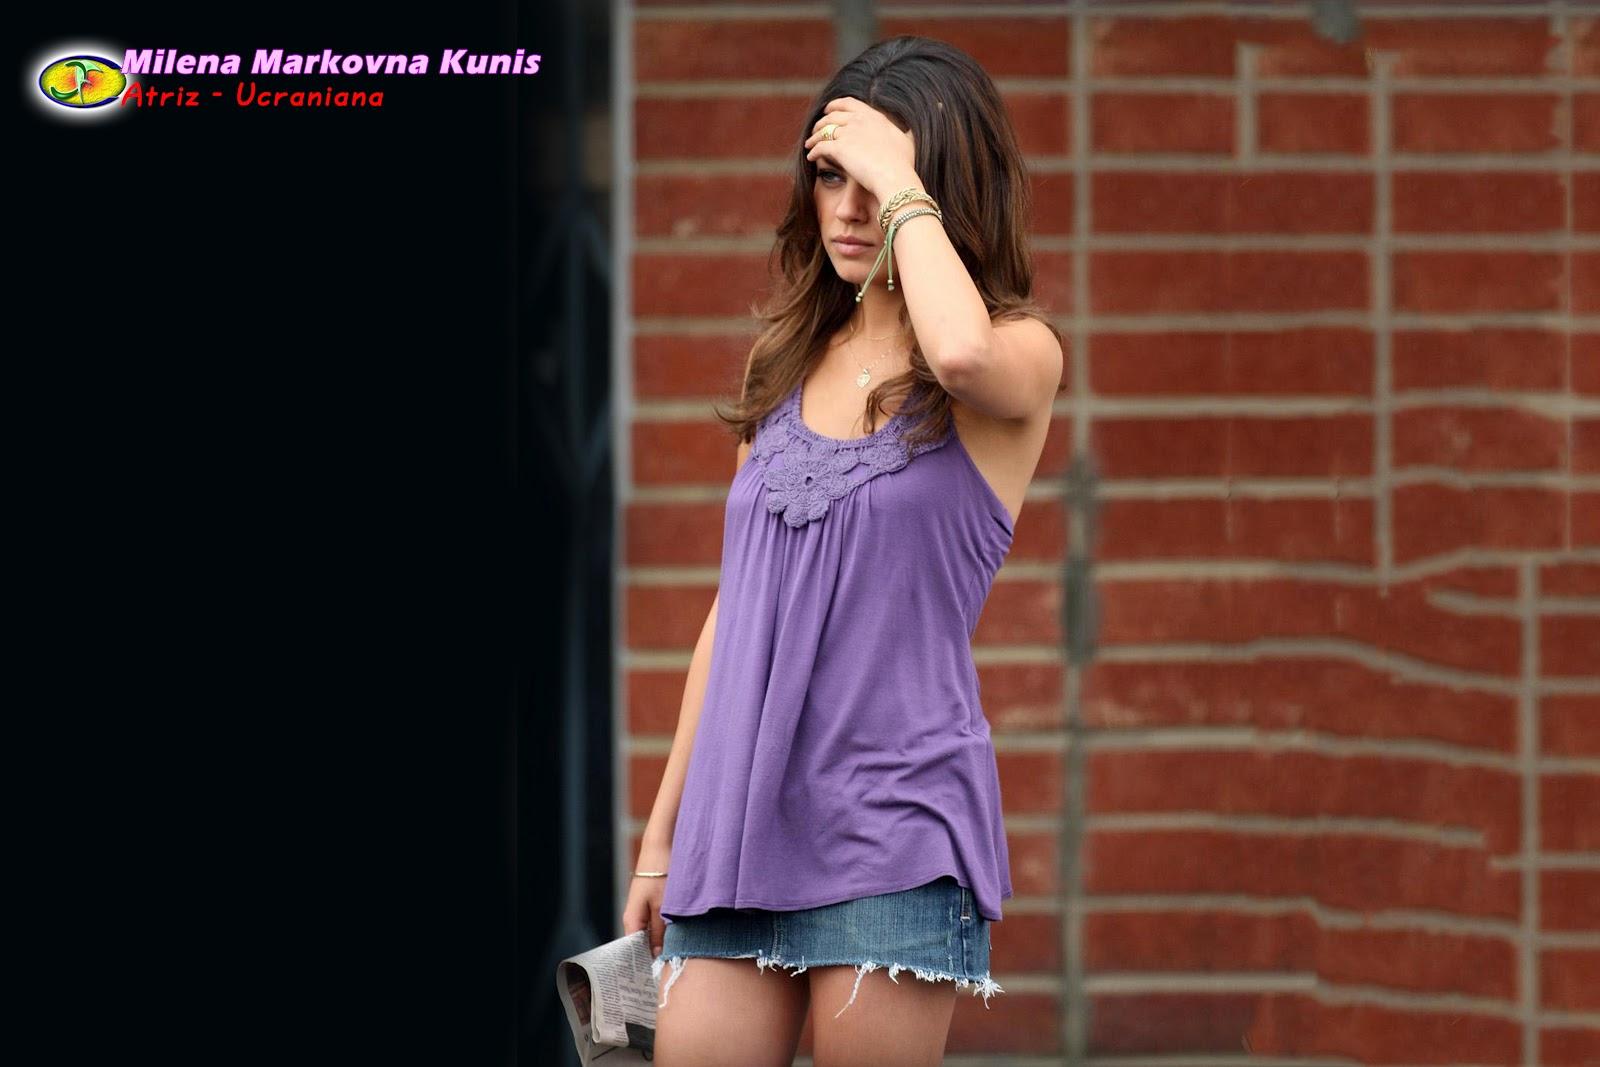 FAMA: Mila Kunis